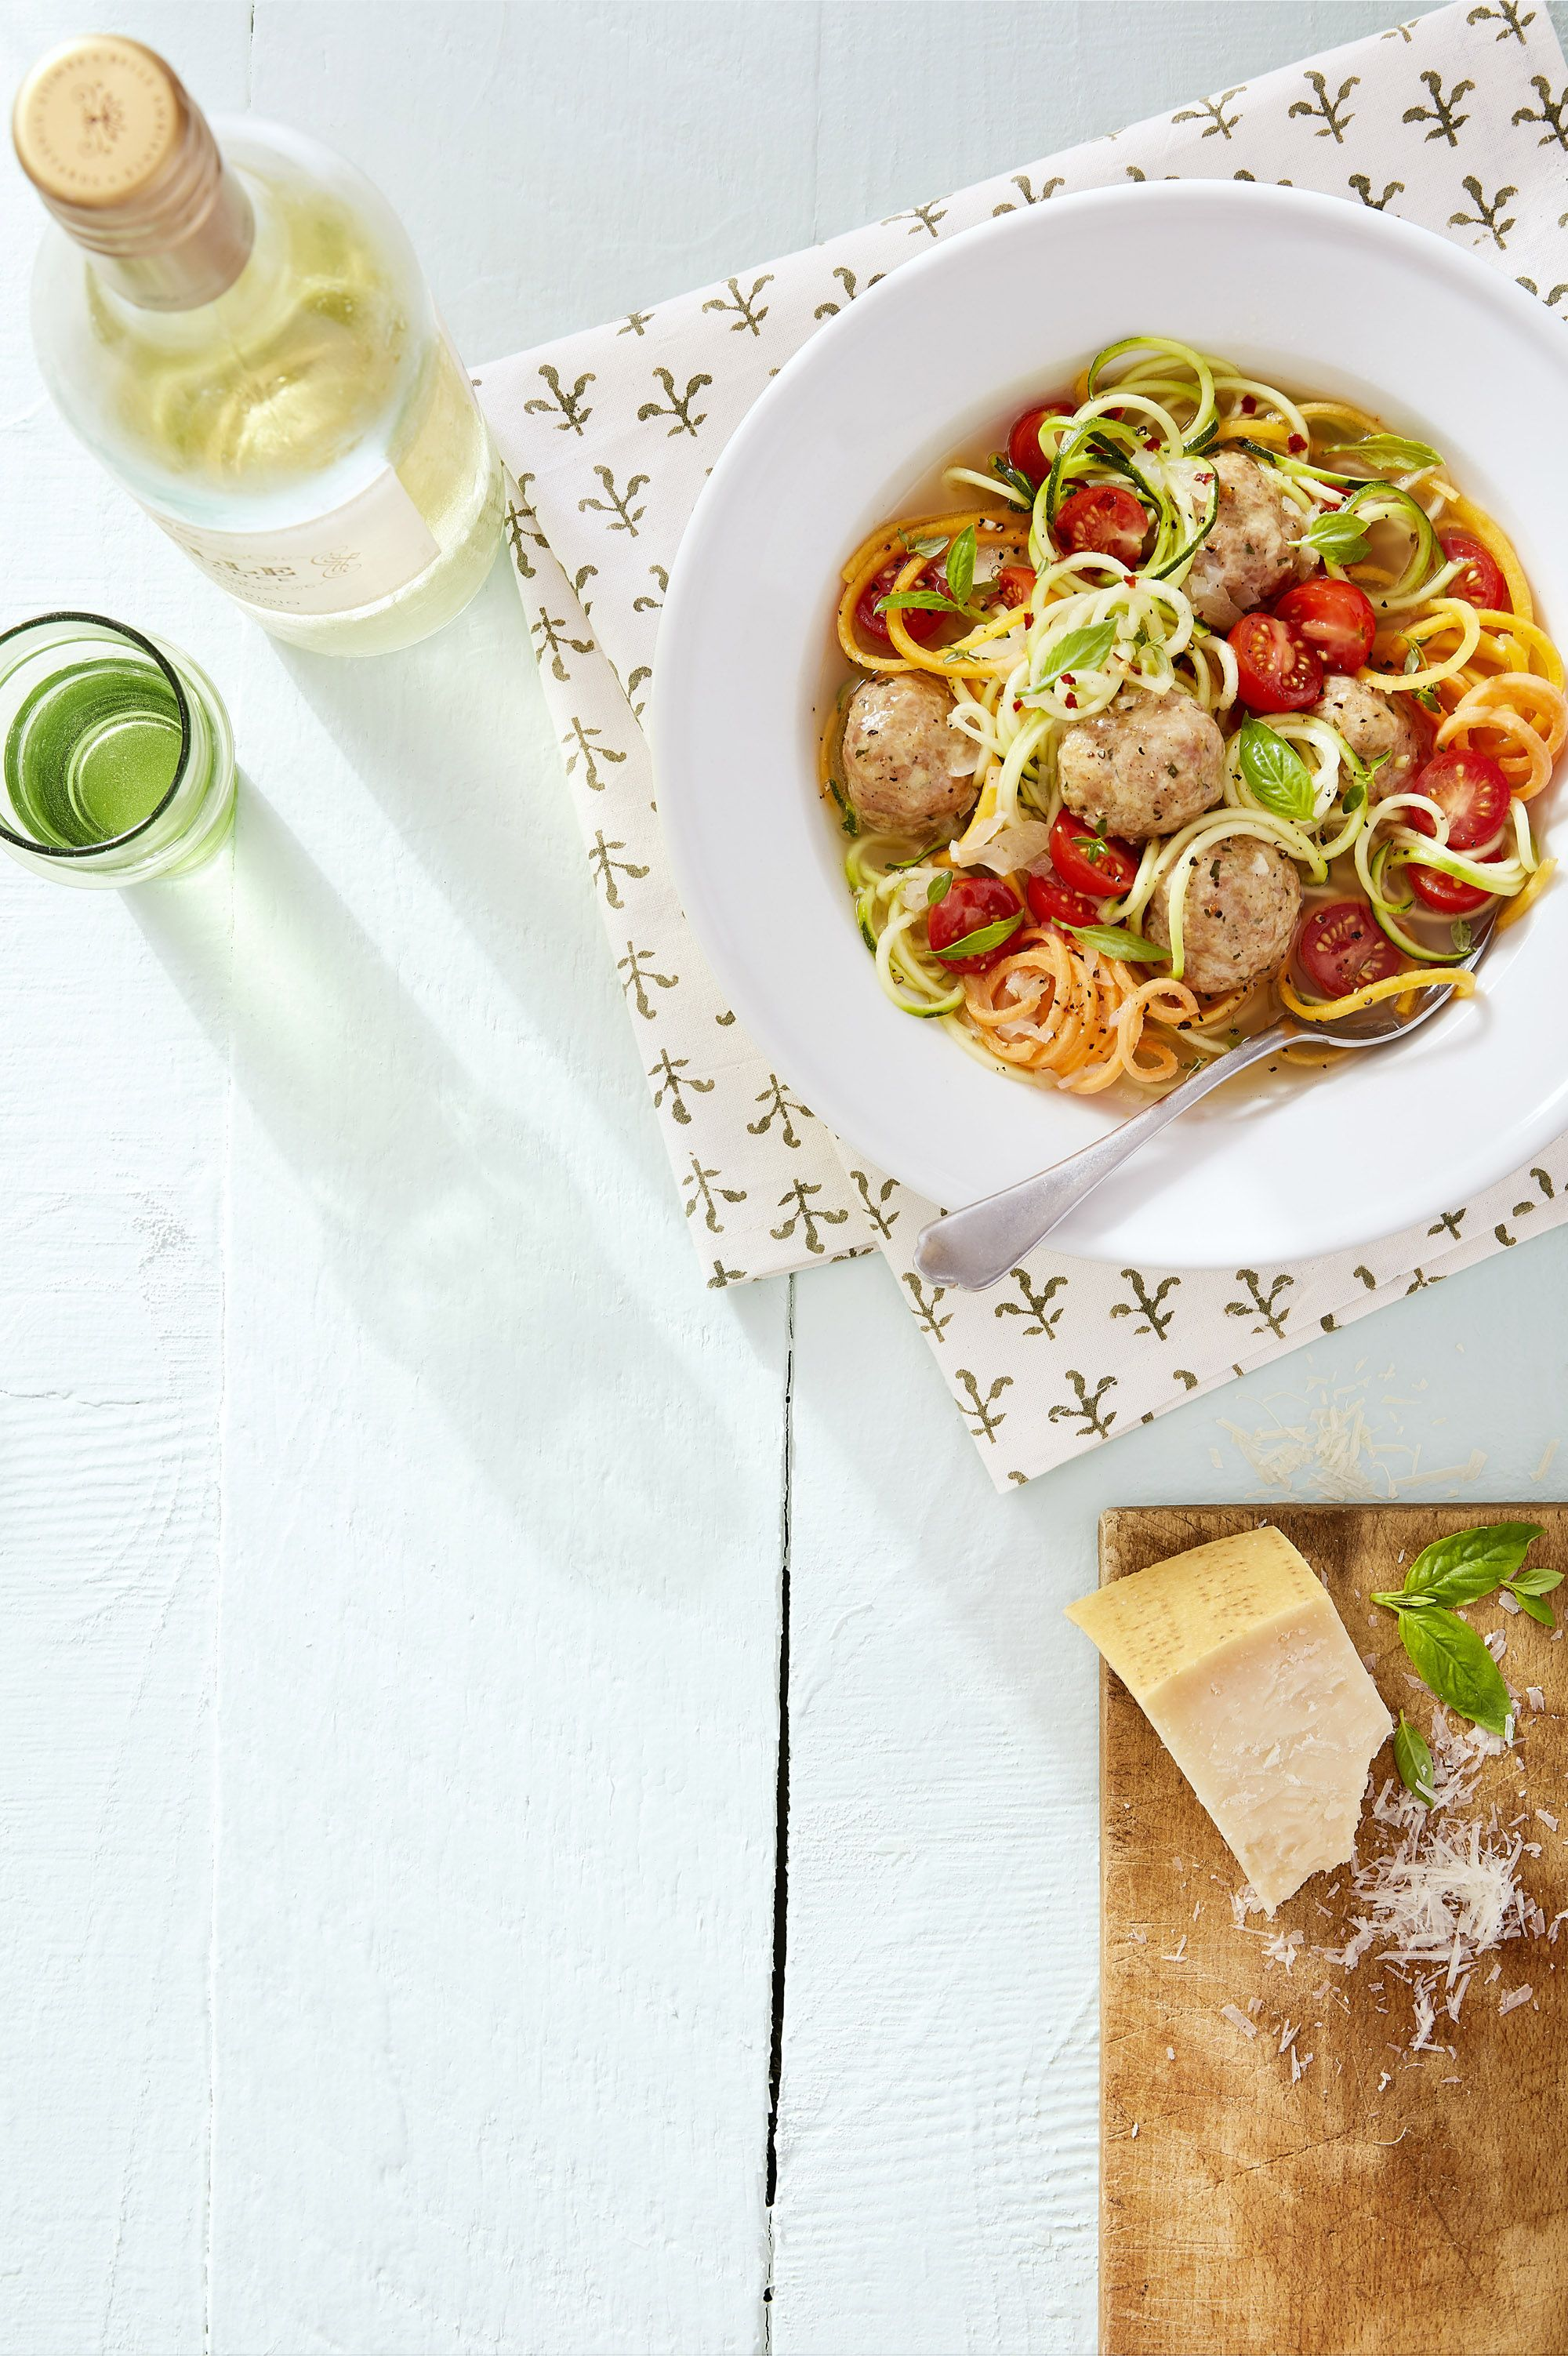 55 Easy Fall Recipes - Best Fall Dinner Ideas